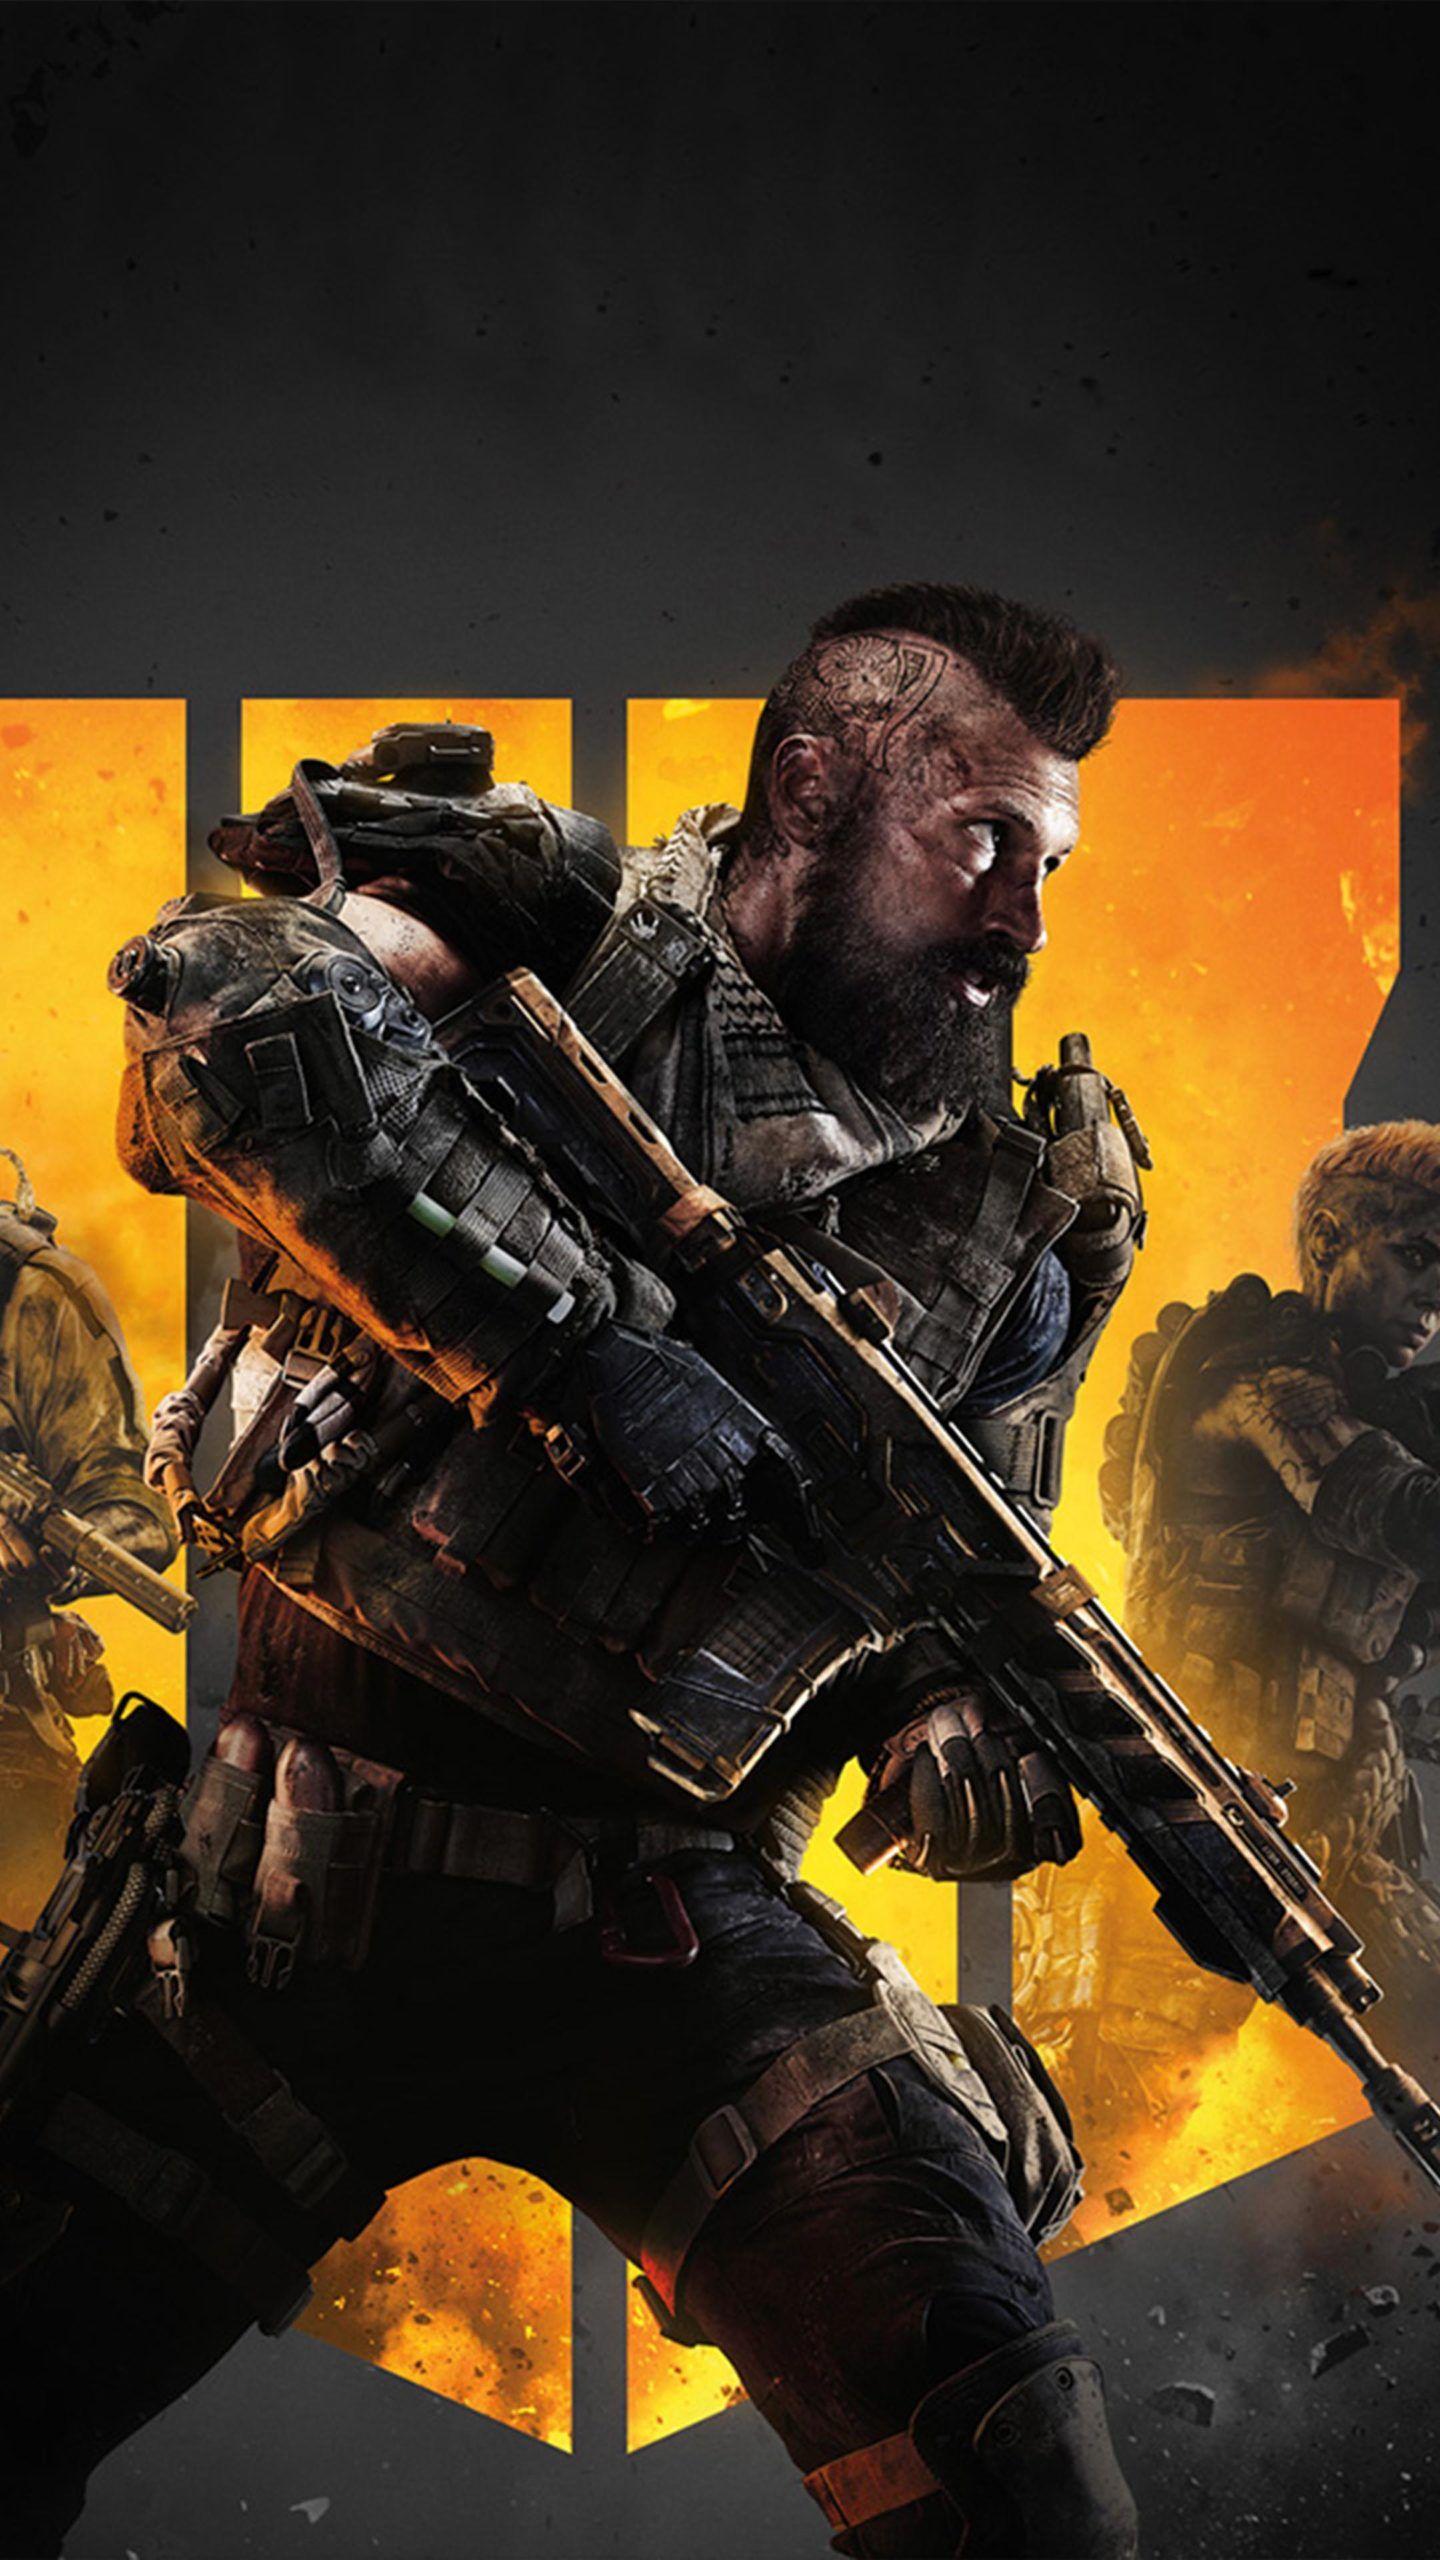 Call Of Duty Black Ops 4 4k Ultra Hd Mobile Wallpaper In 2021 Call Of Duty Call Of Duty Black Call Of Duty Black Ops 4